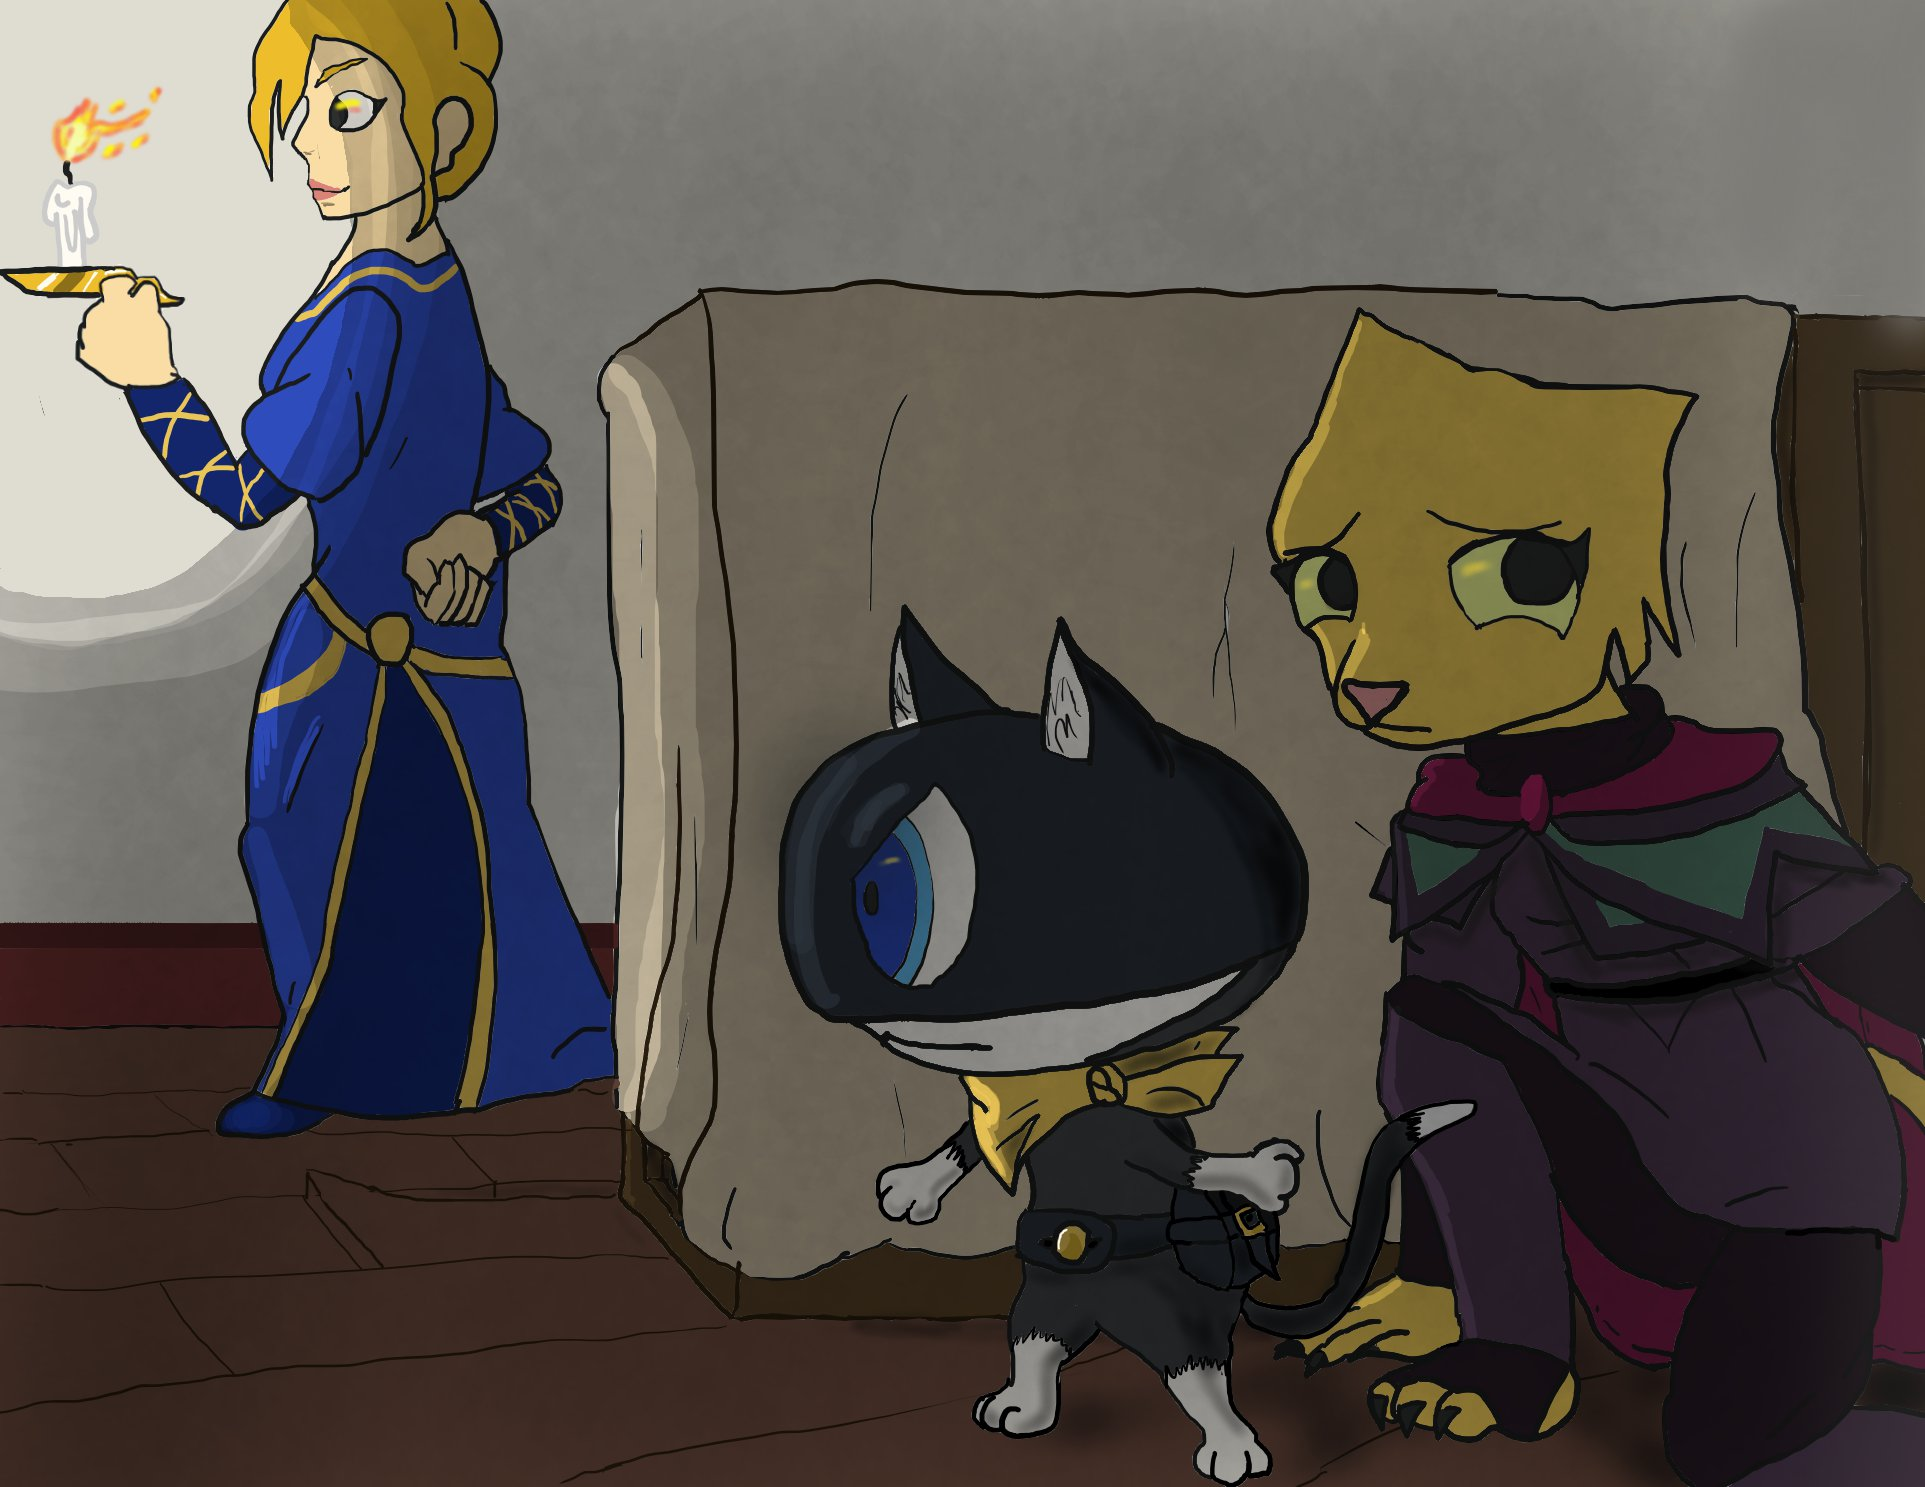 image 4150 cloak of gray tomorrow katia s thief tunic artist